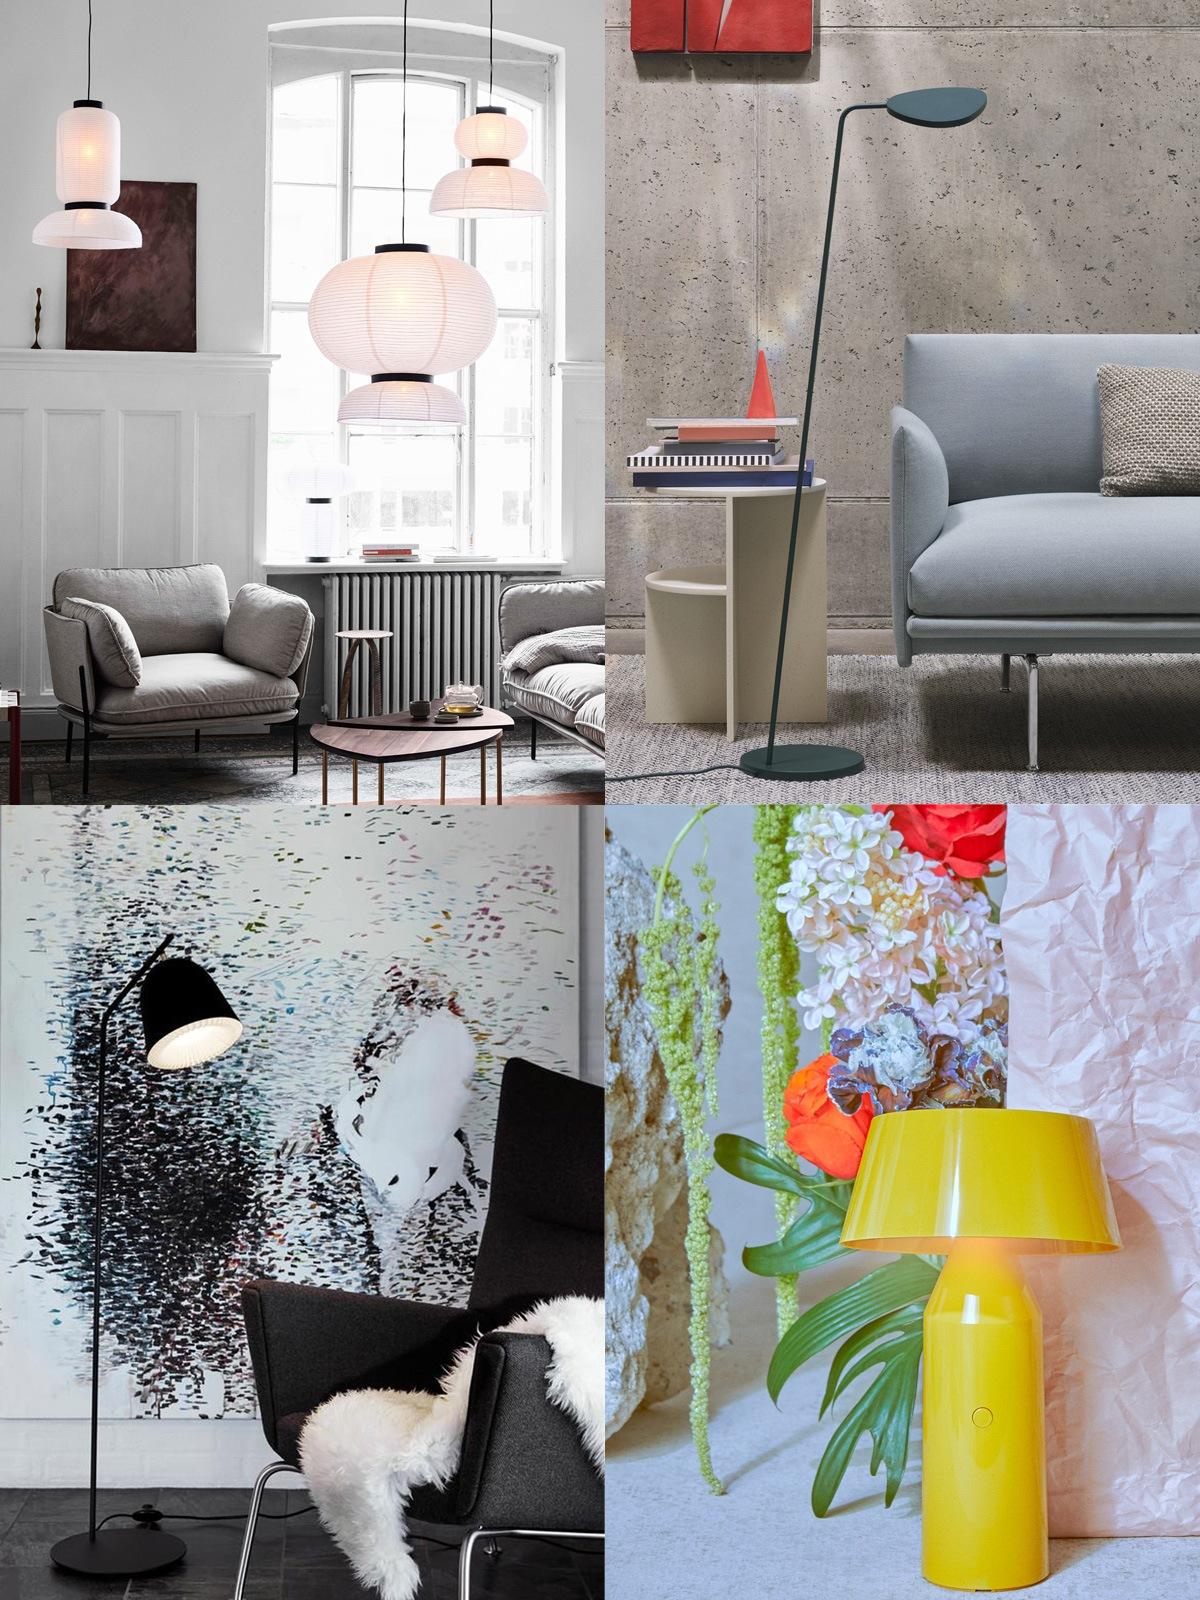 Best of DesignOrt LampenBlog WohnIdee Onlineshop Leuchten Berlin